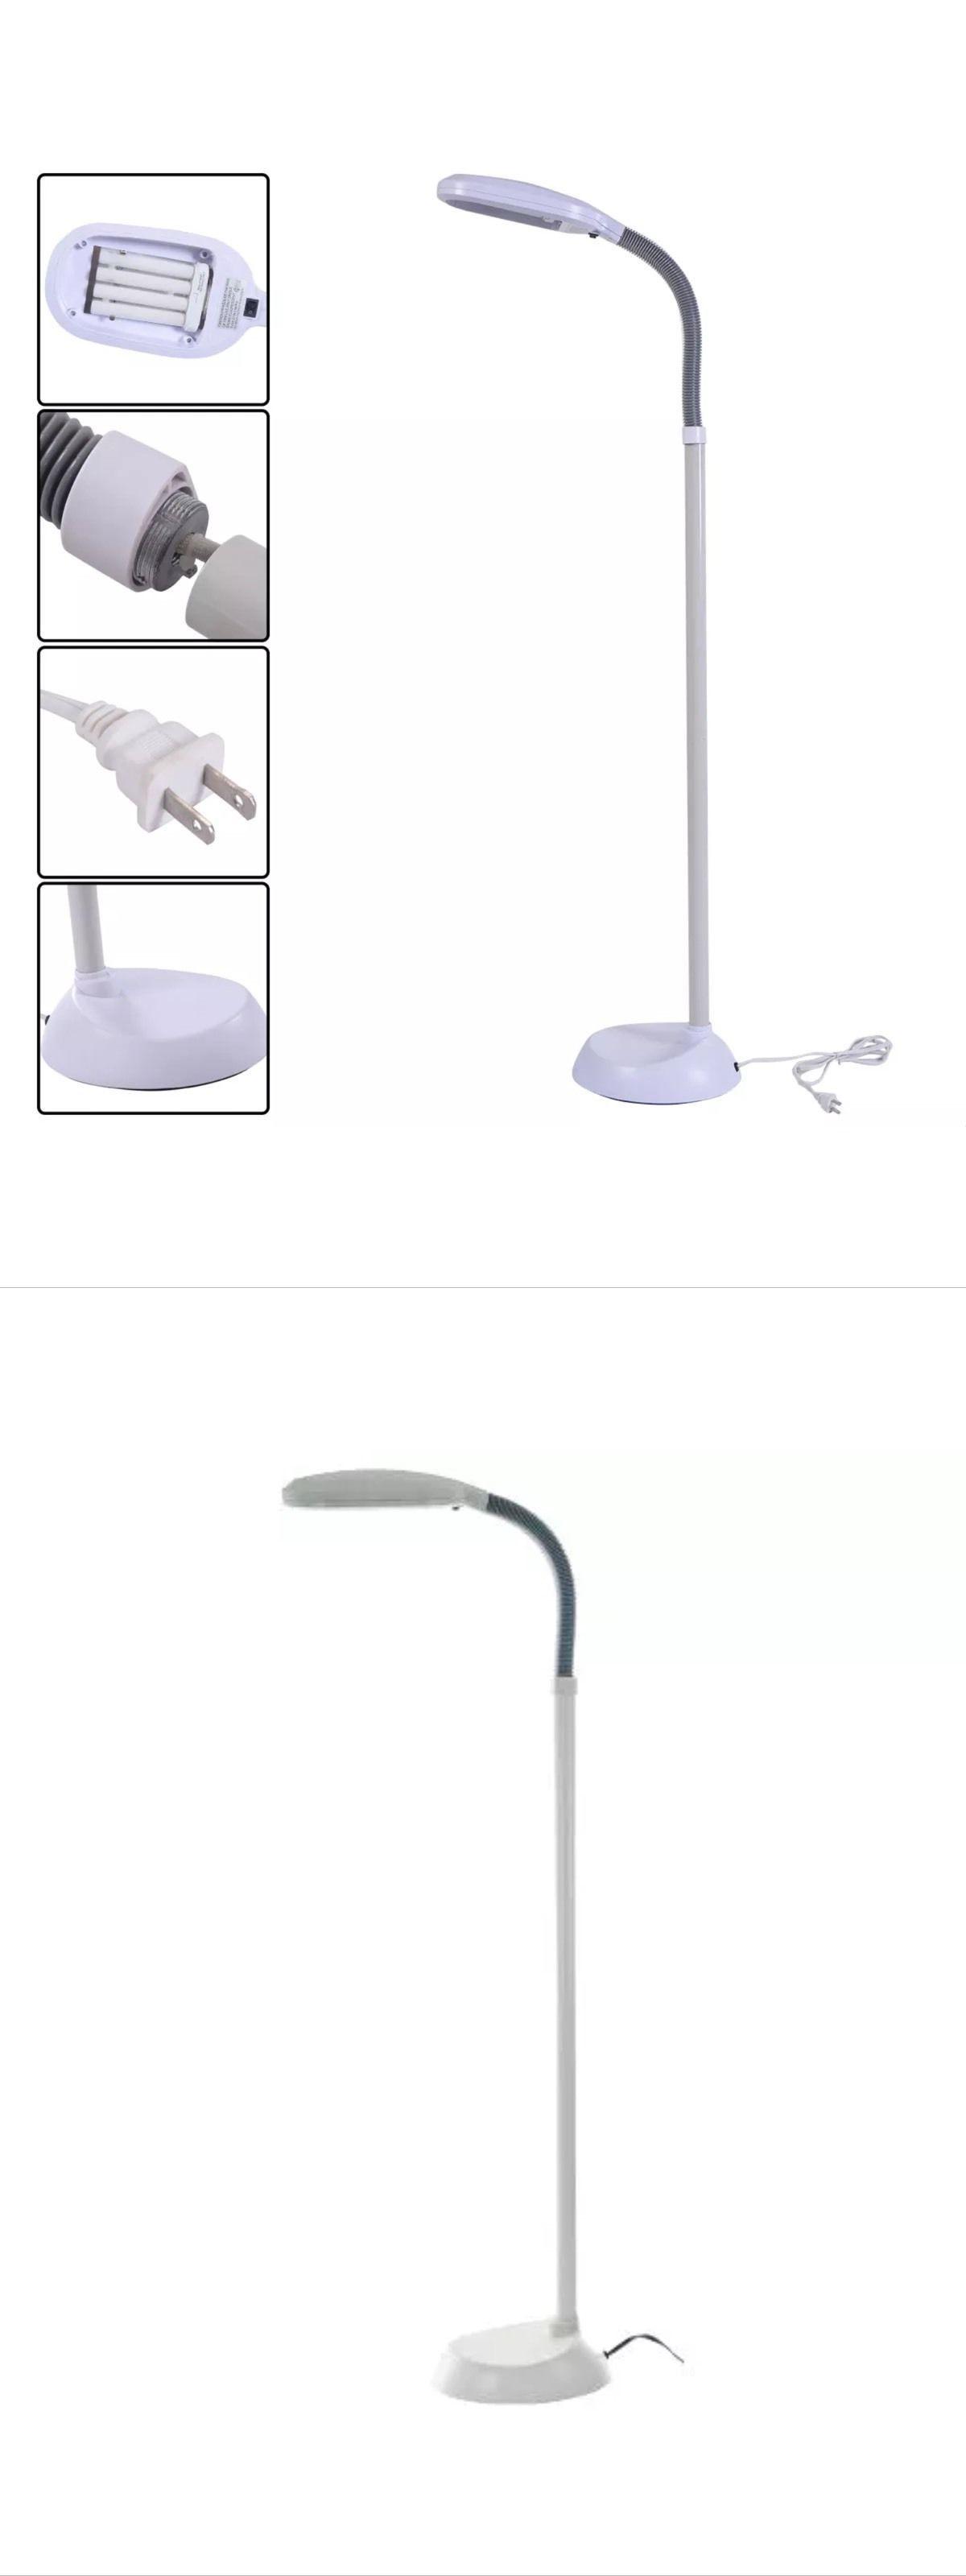 Eyelash Tools: Eyelash Extension Kit Beauty Lamp Furniture Equipment Glue  (Bright Light)